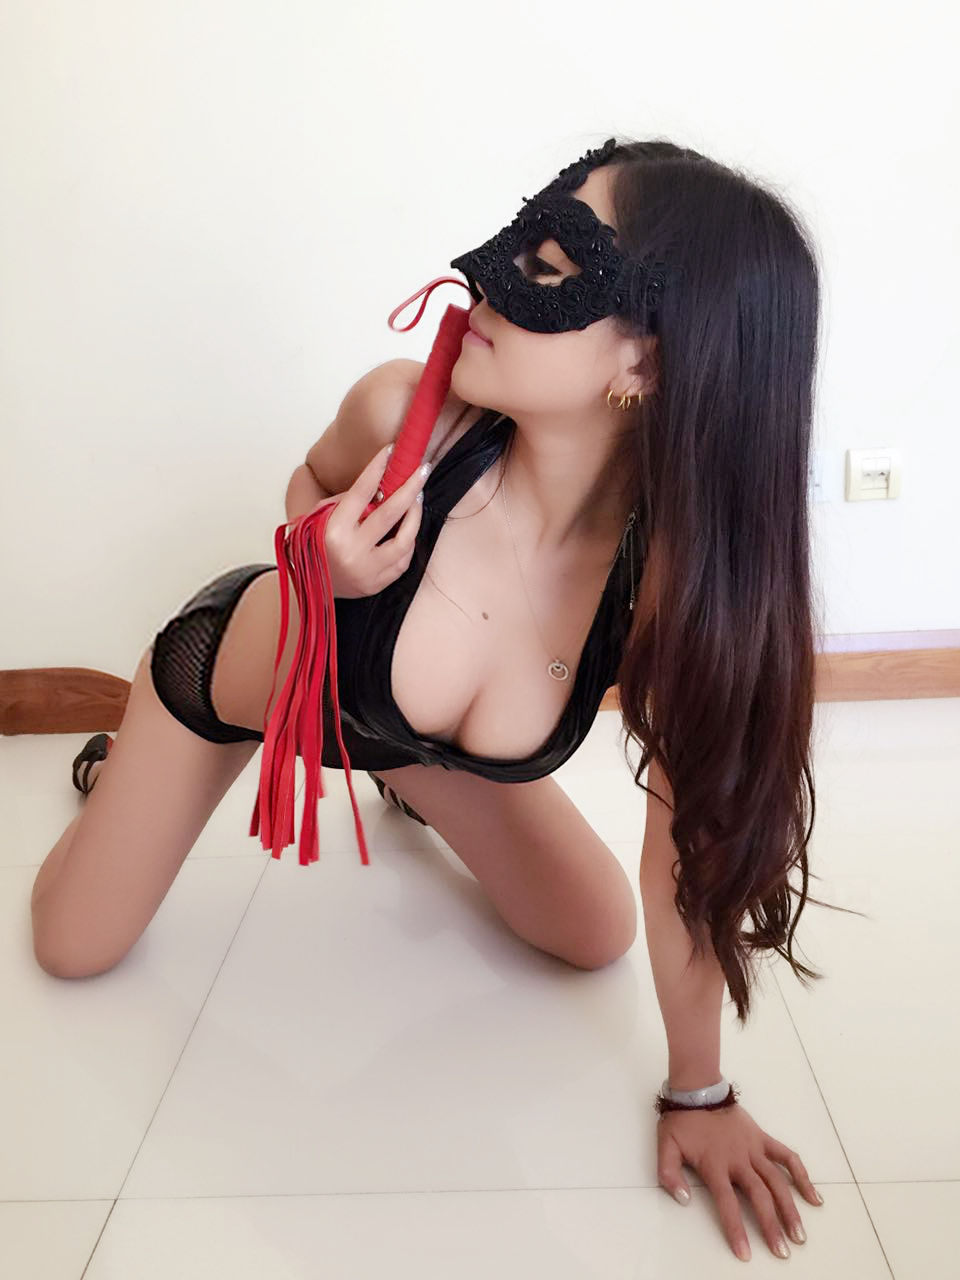 sexy thai homoseksuell massage thai escort review